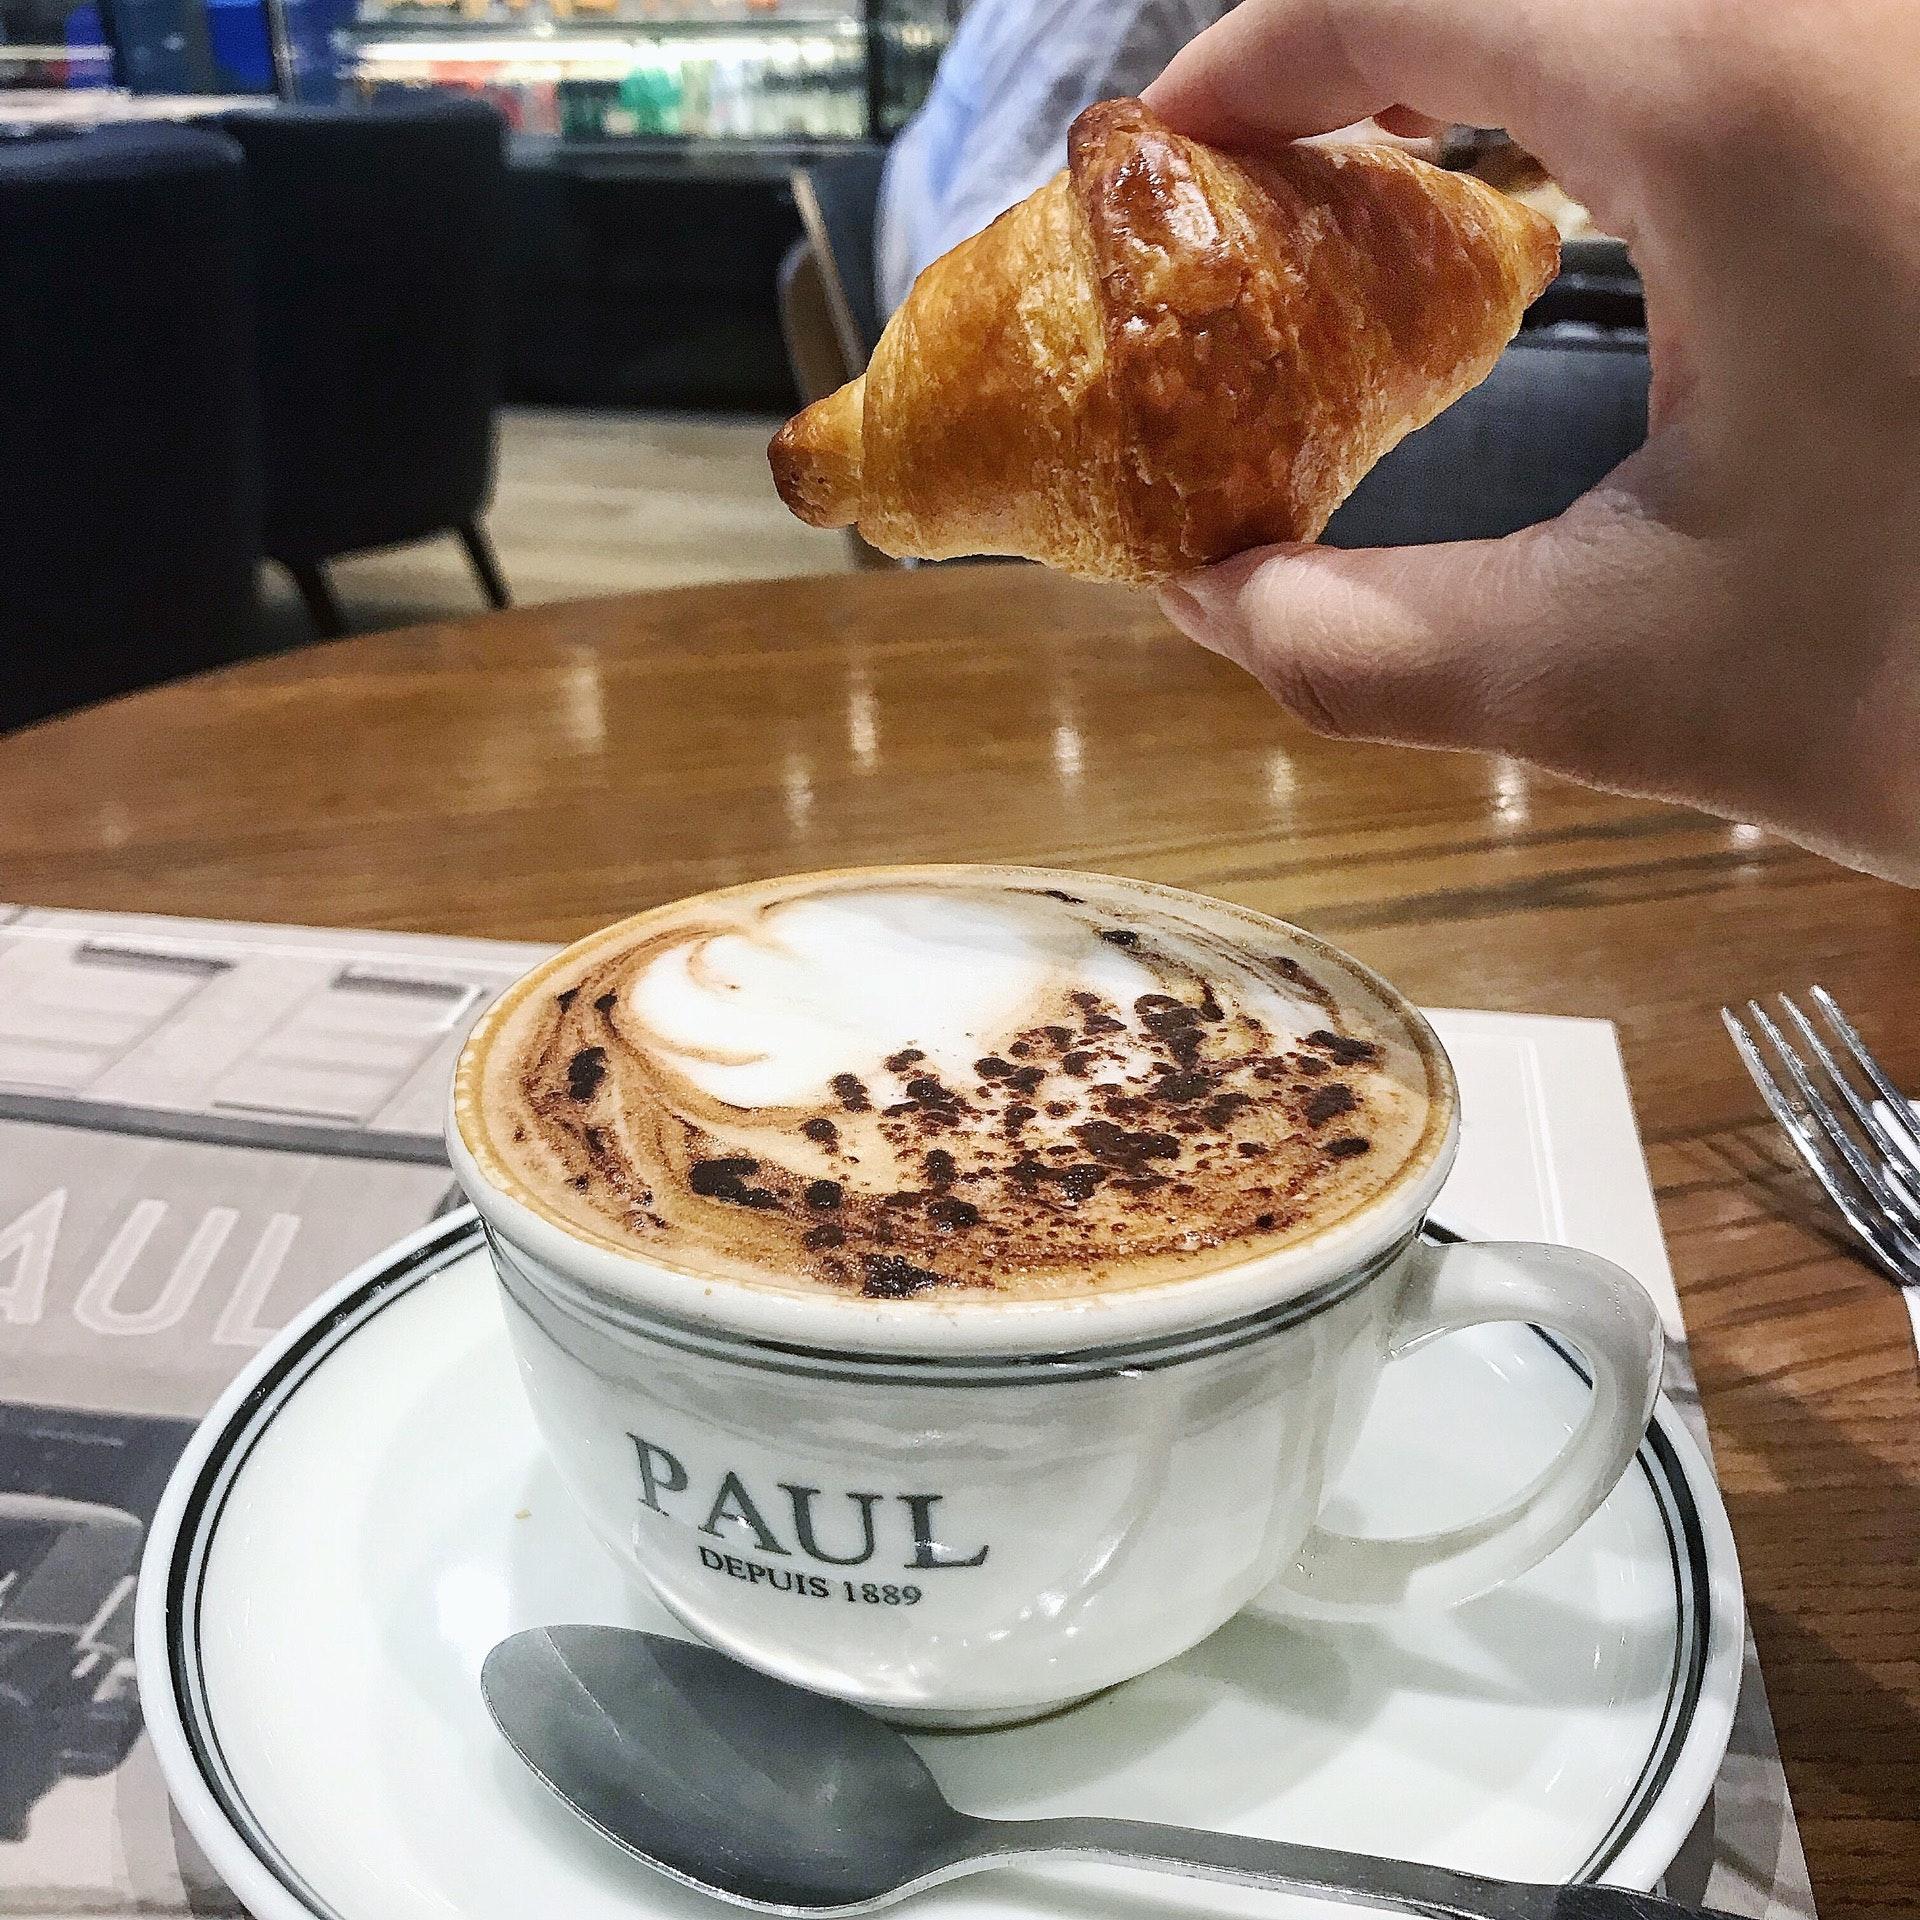 PAUL (Westgate)